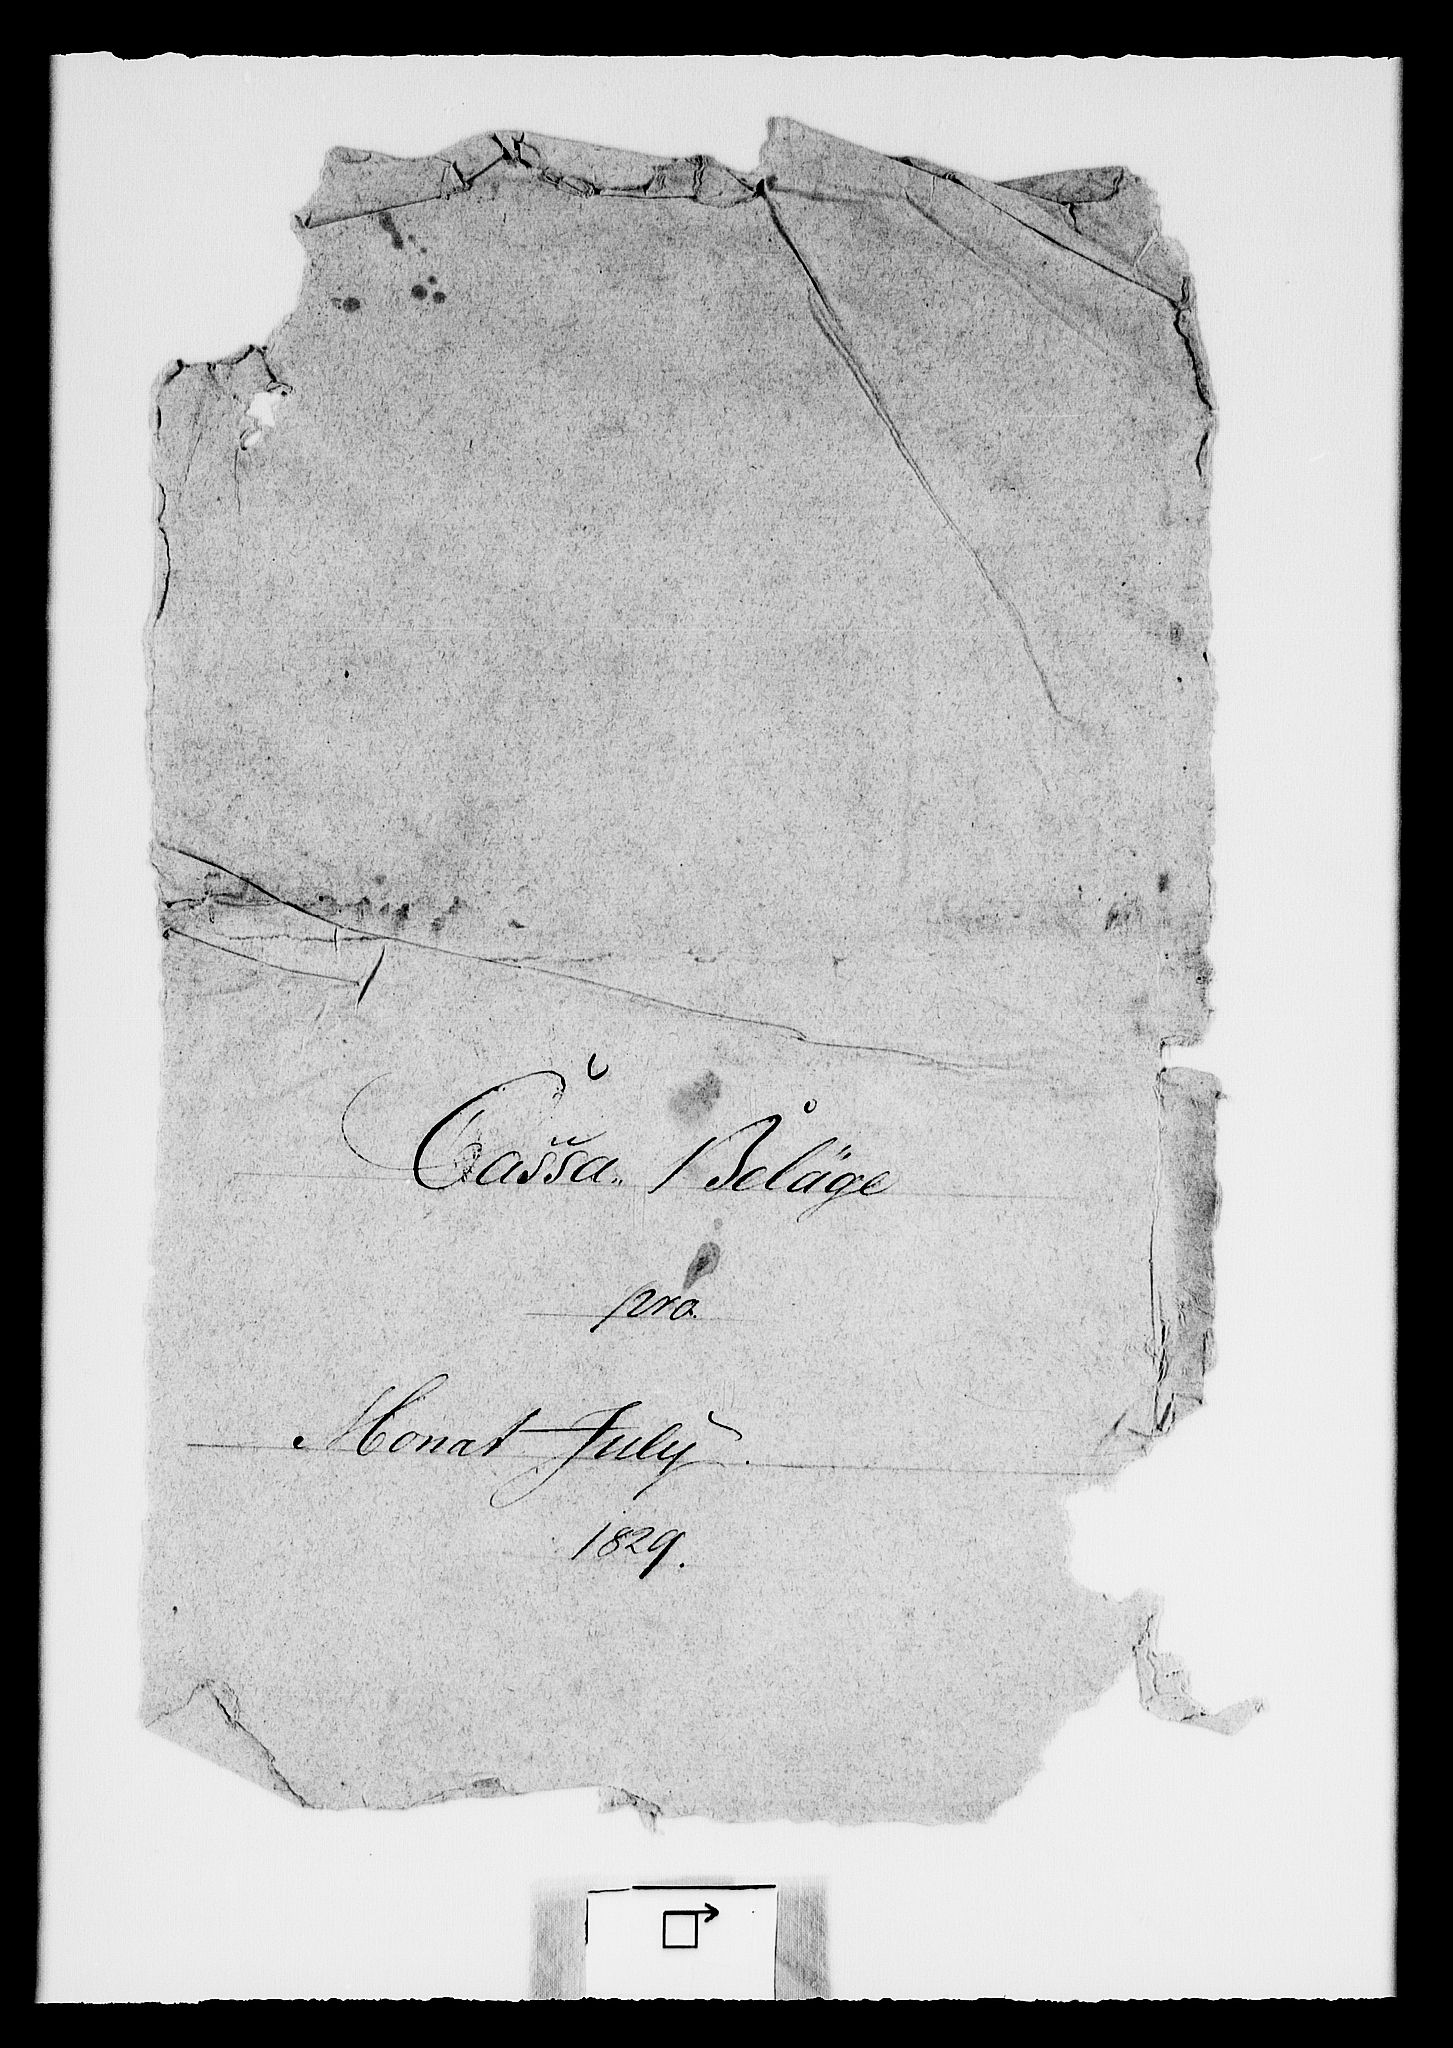 RA, Modums Blaafarveværk, G/Gd/Gdc/L0233, 1829-1831, s. 2